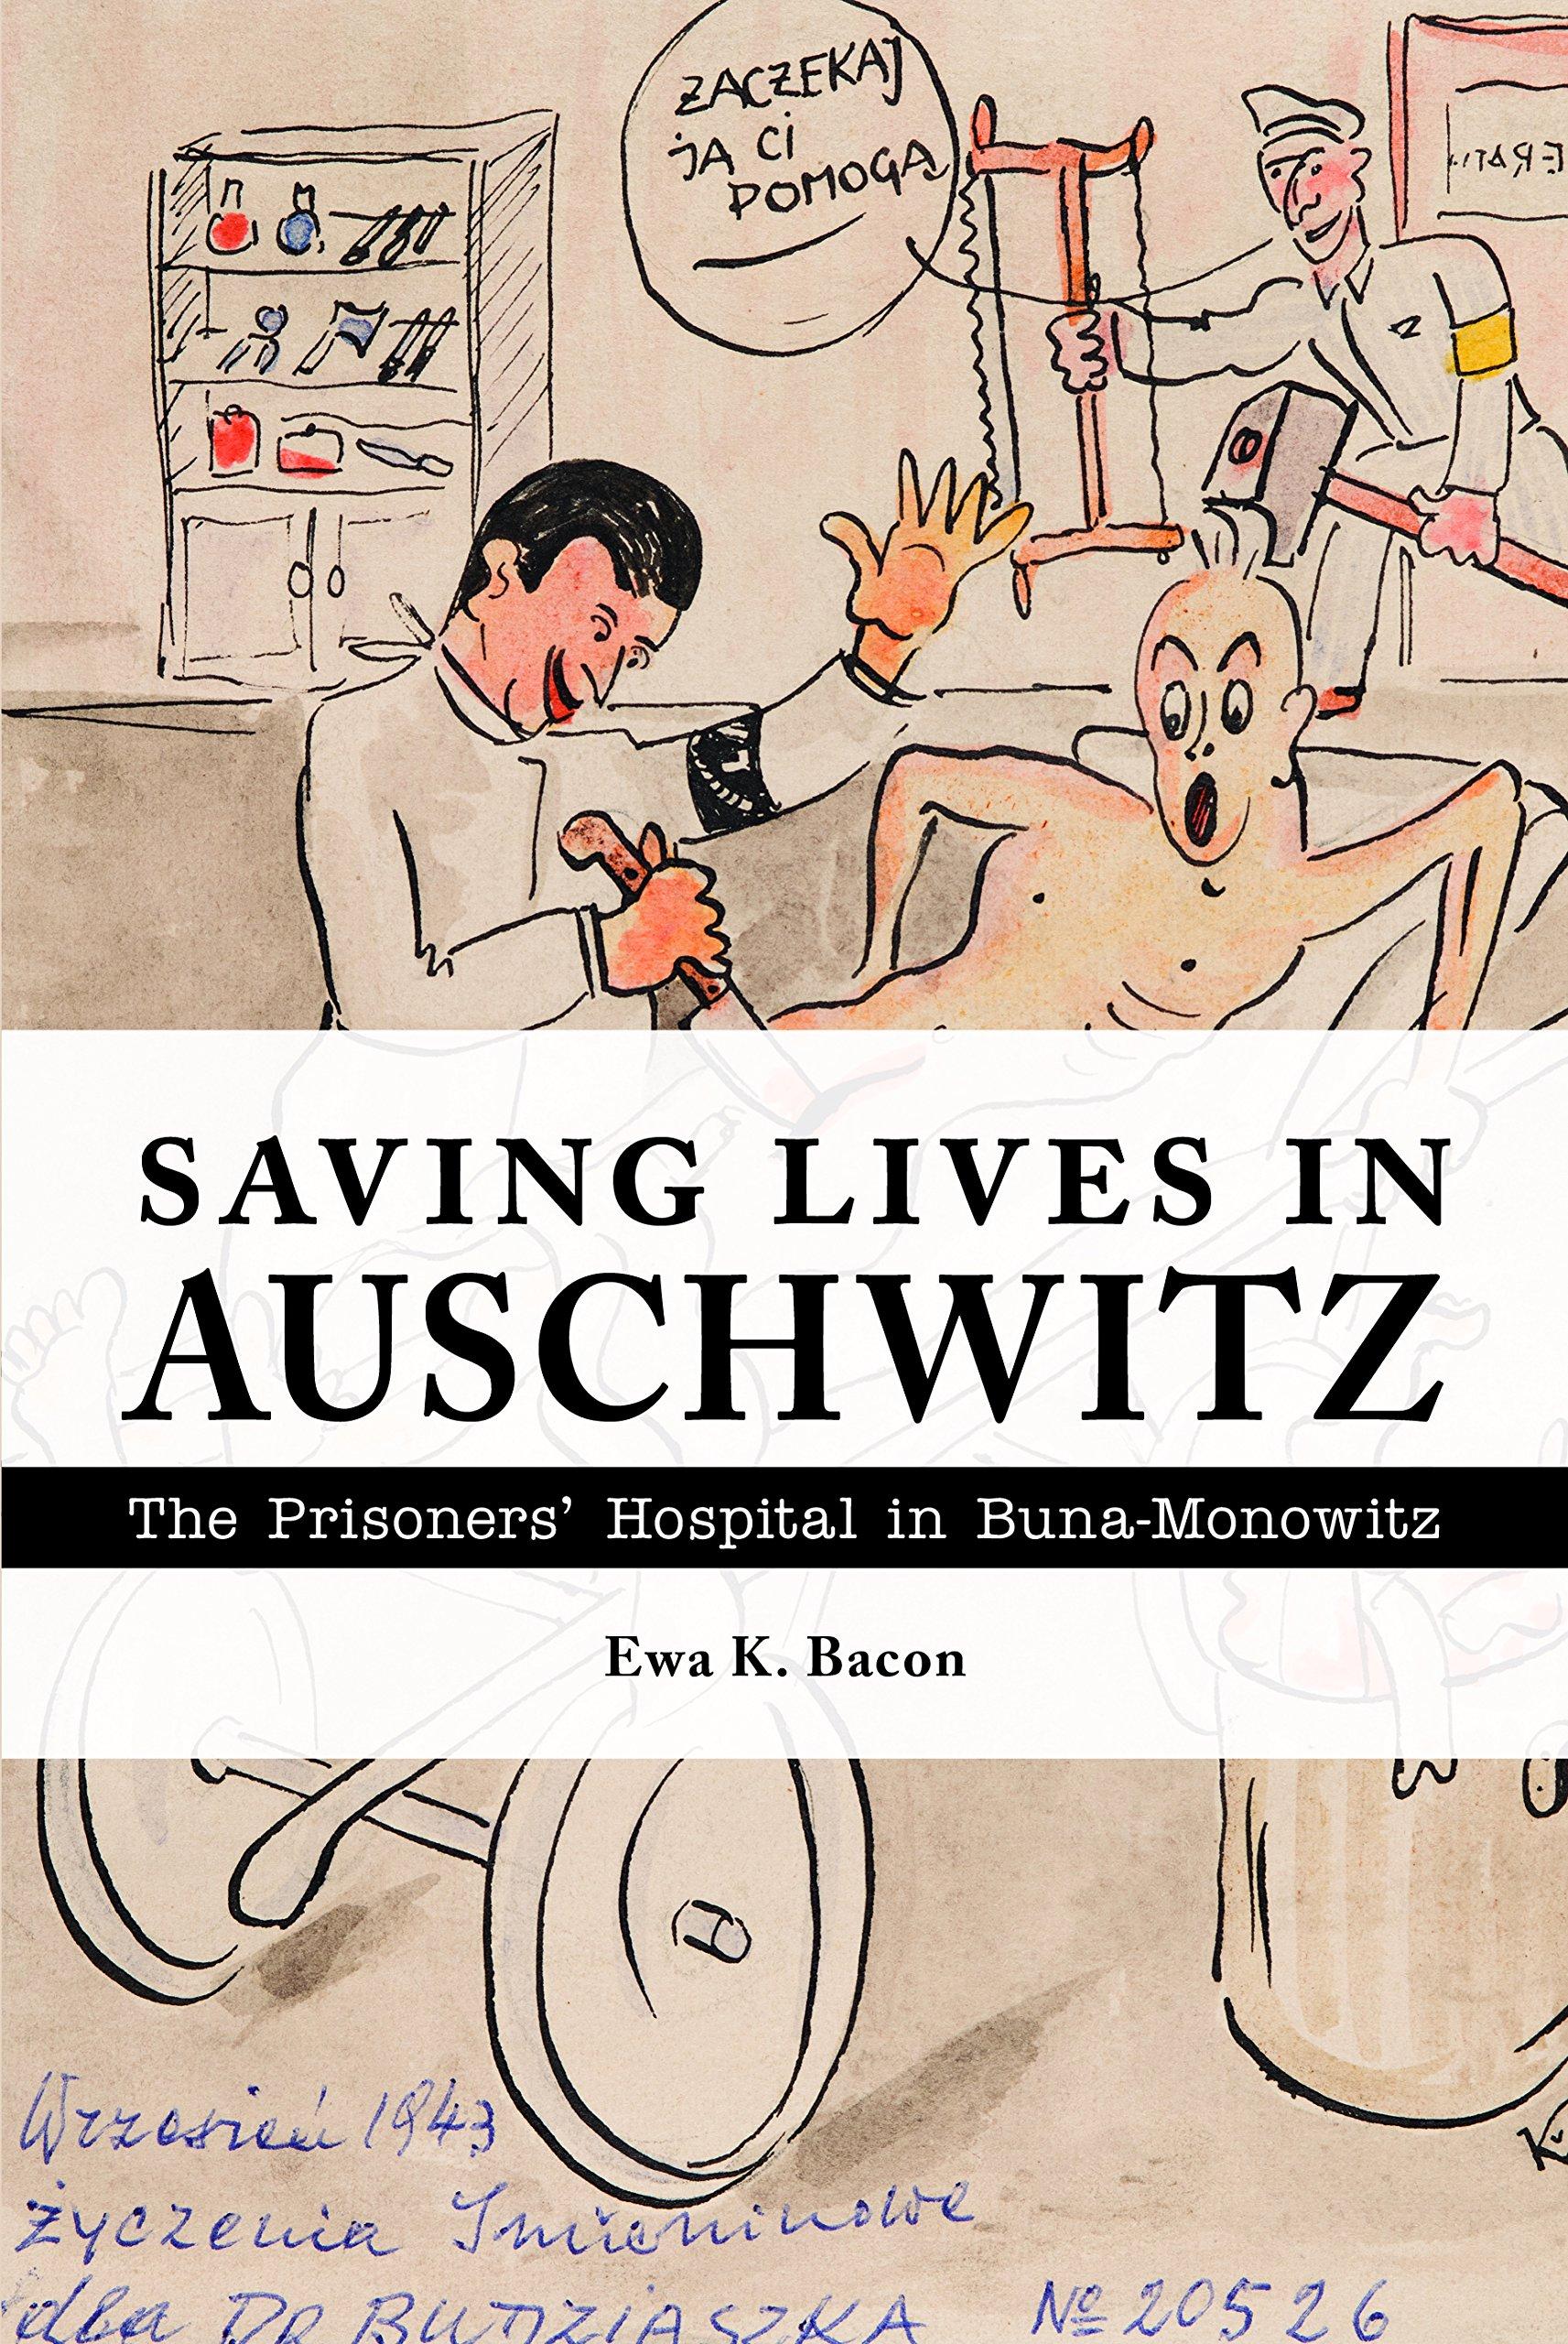 Saving Lives in Auschwitz: The Prisoners' Hospital in Buna-Monowitz